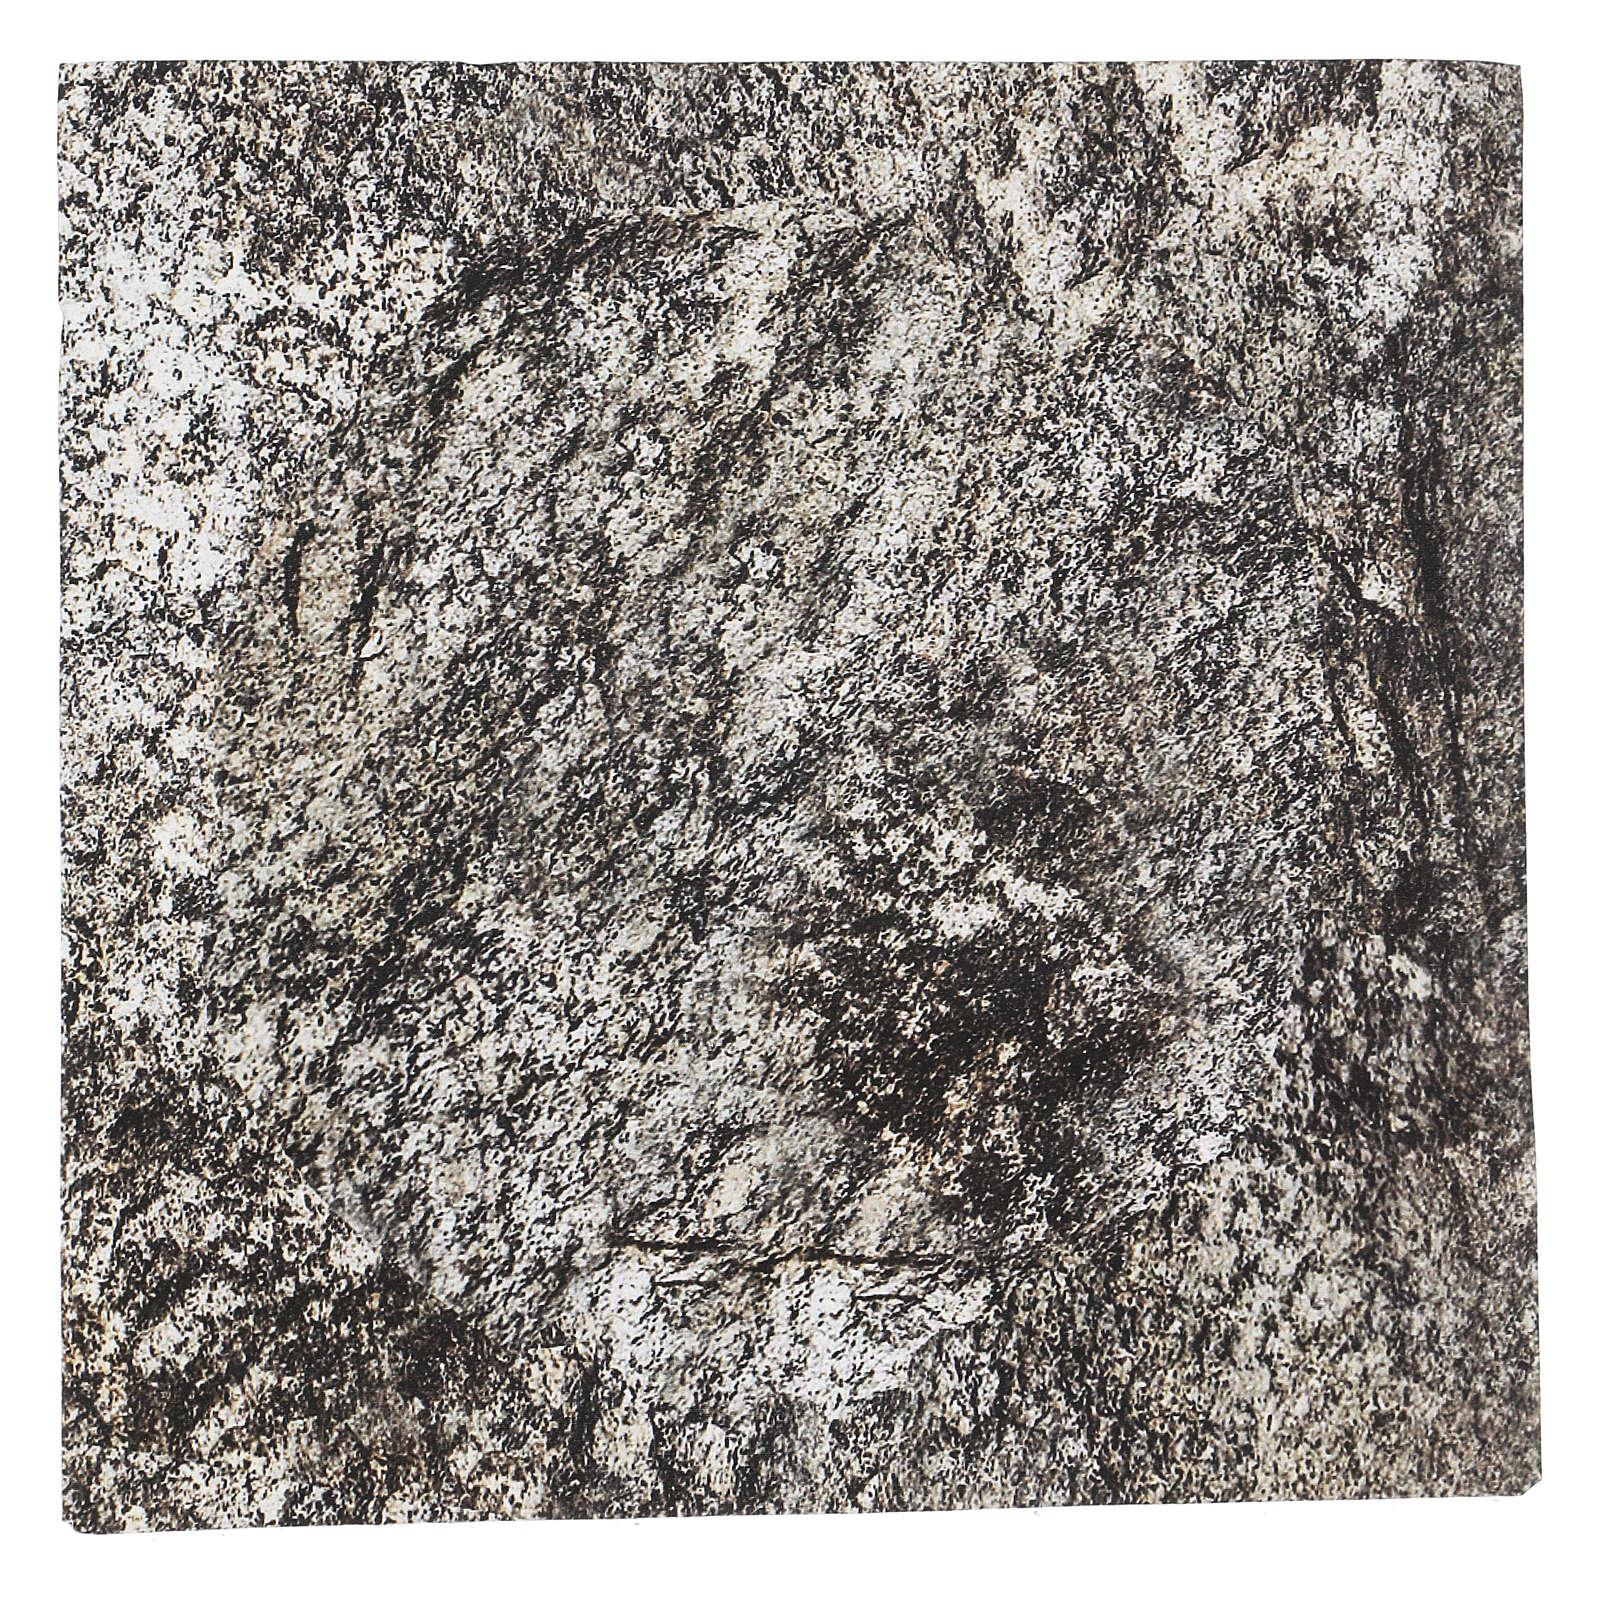 Carta plasmabile roccia 30x30 cm per presepi 4